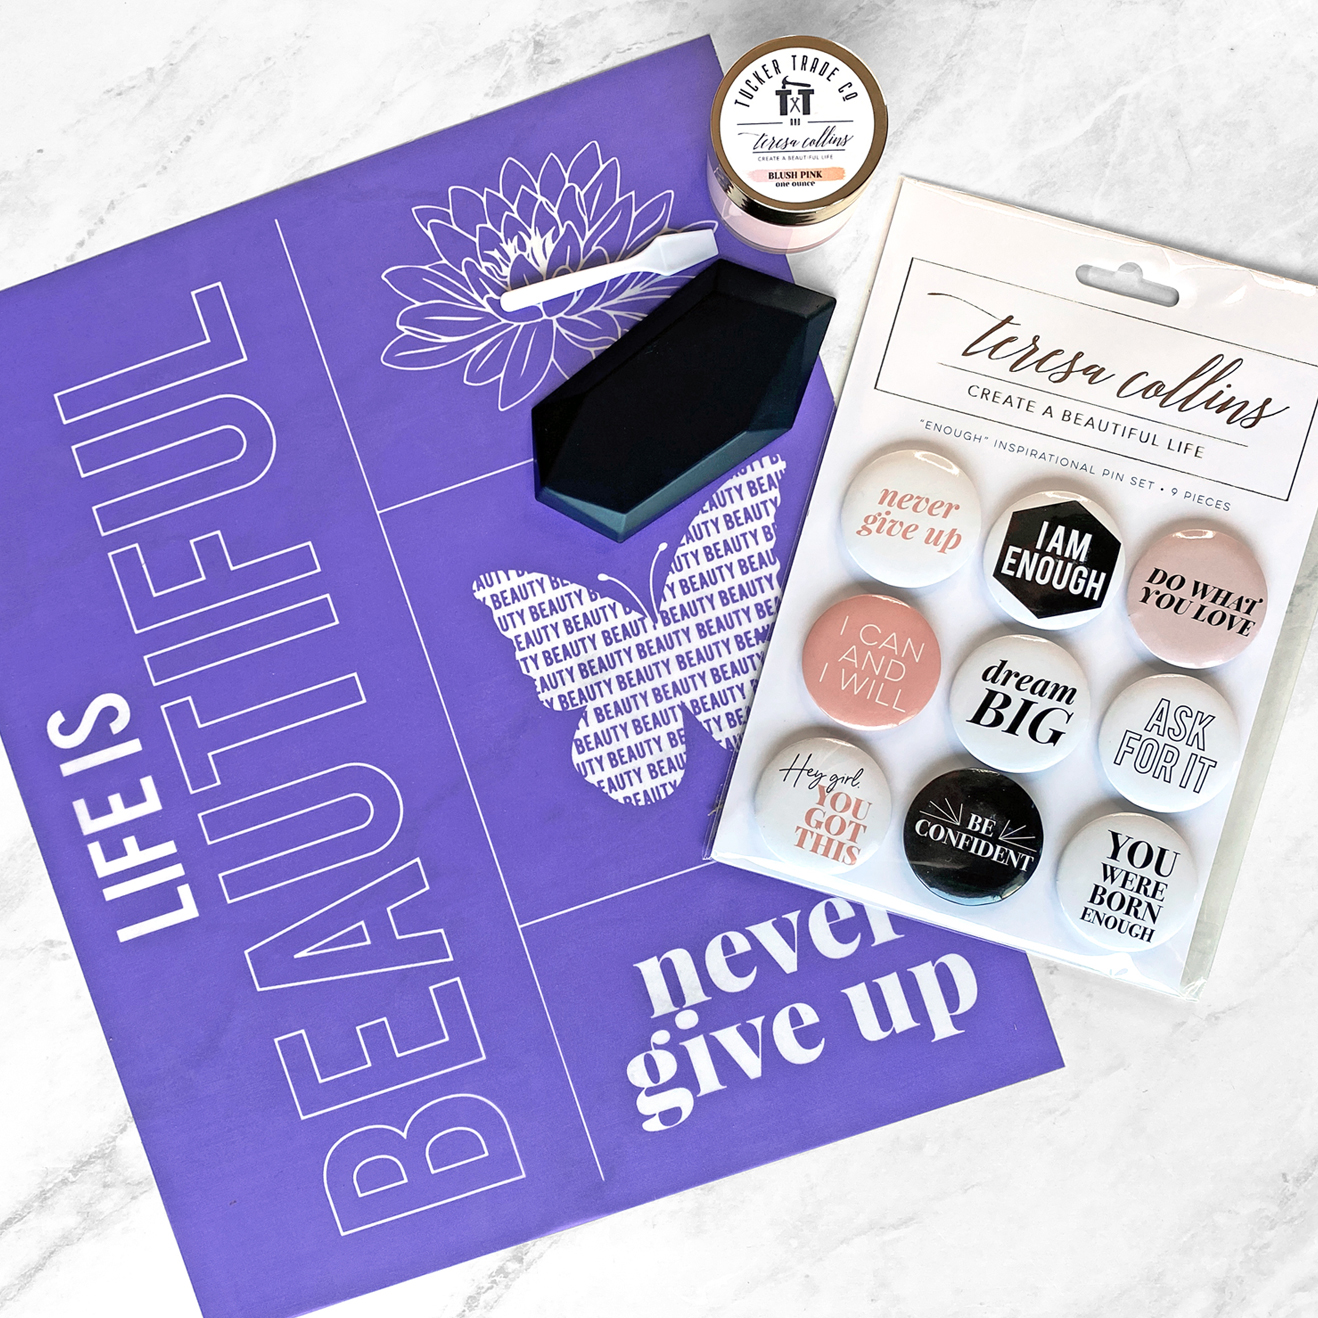 ikonart custom stencil kit and bundles